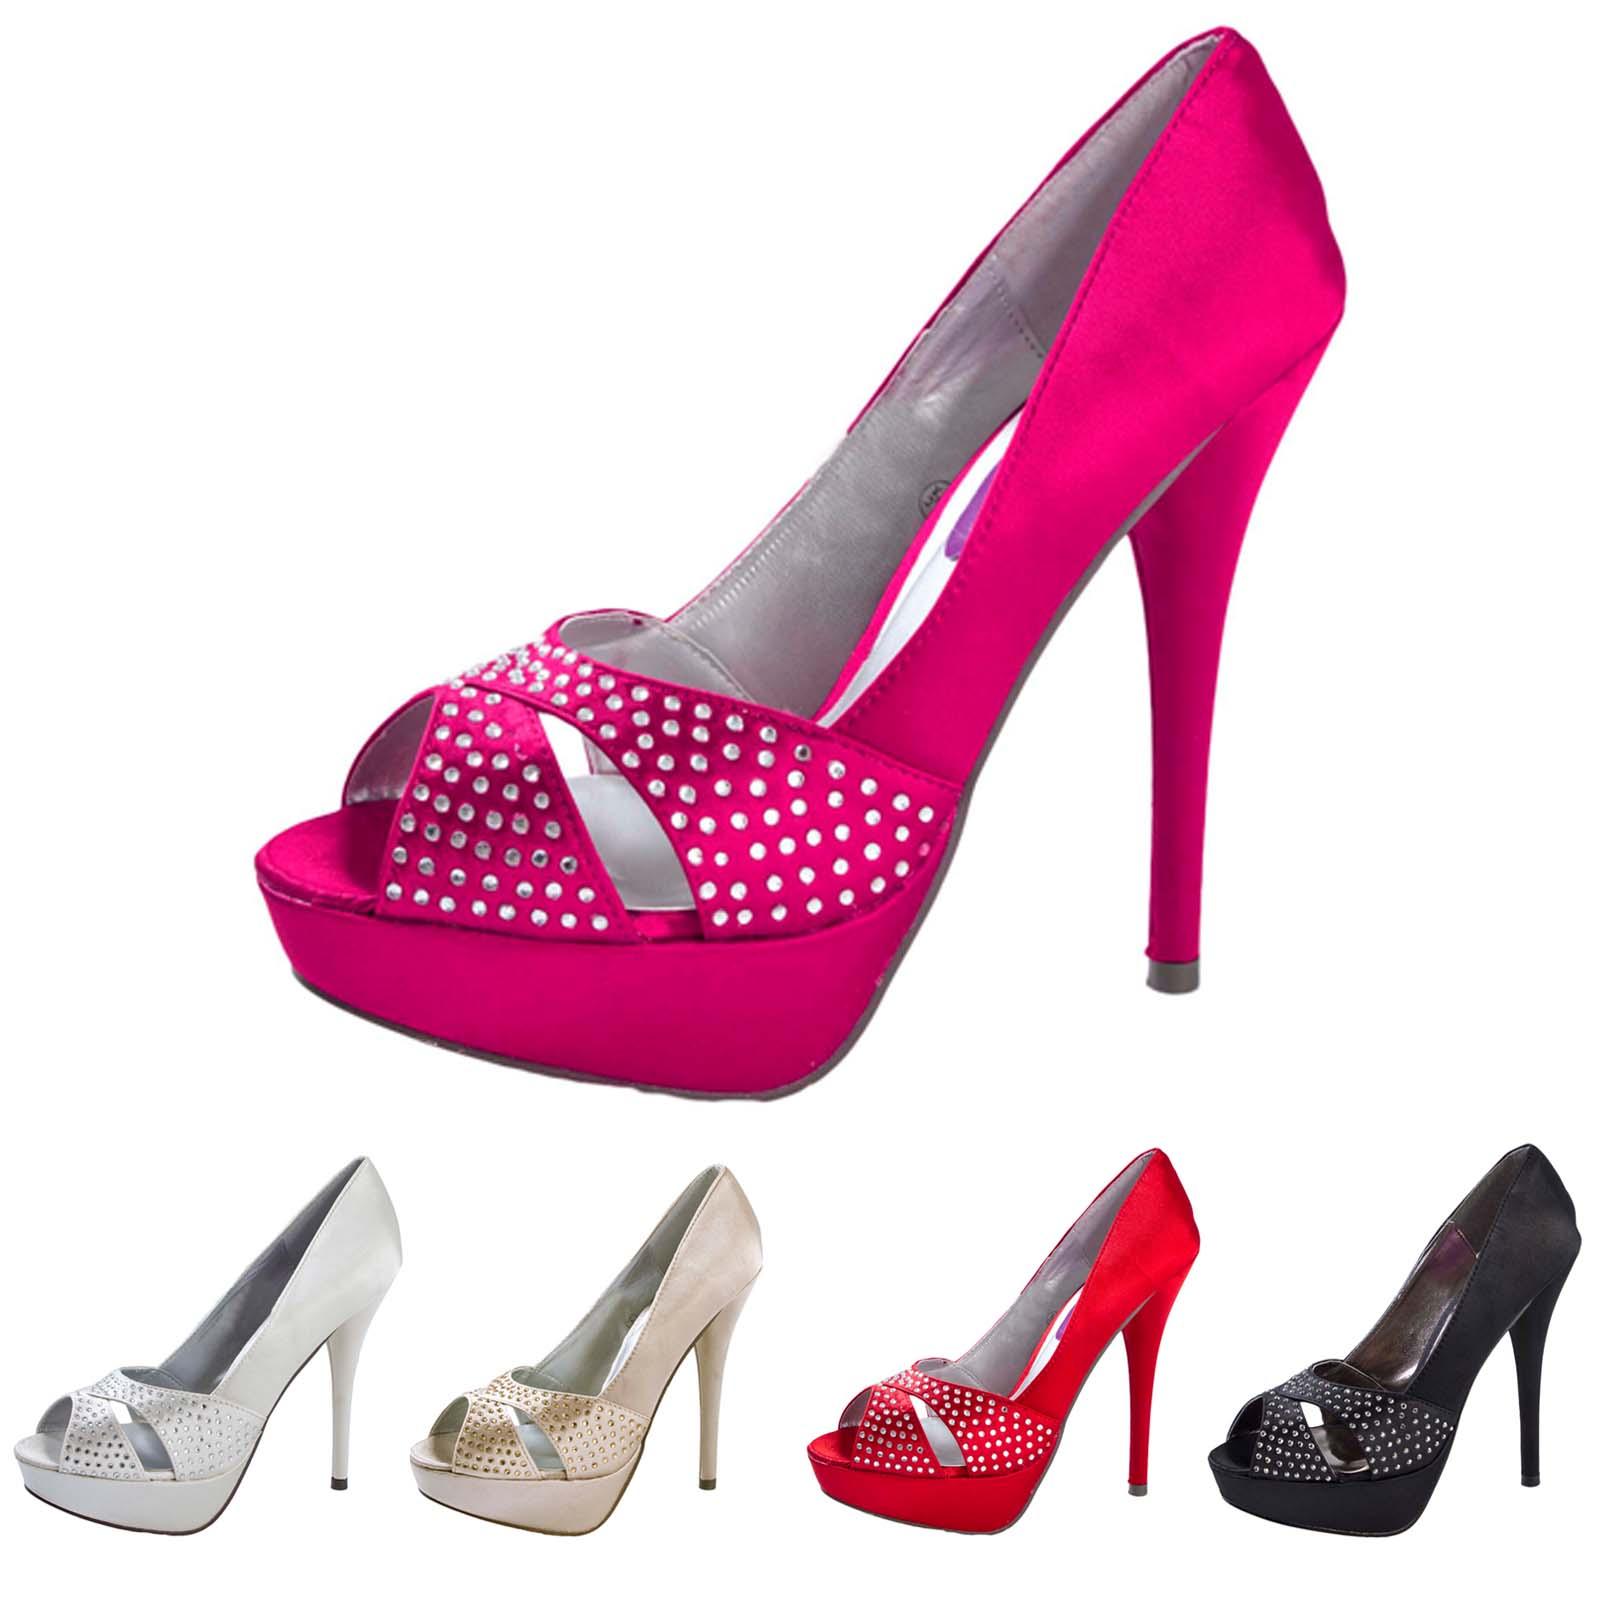 womens peep toe diamante high heels satin bridal wedding. Black Bedroom Furniture Sets. Home Design Ideas